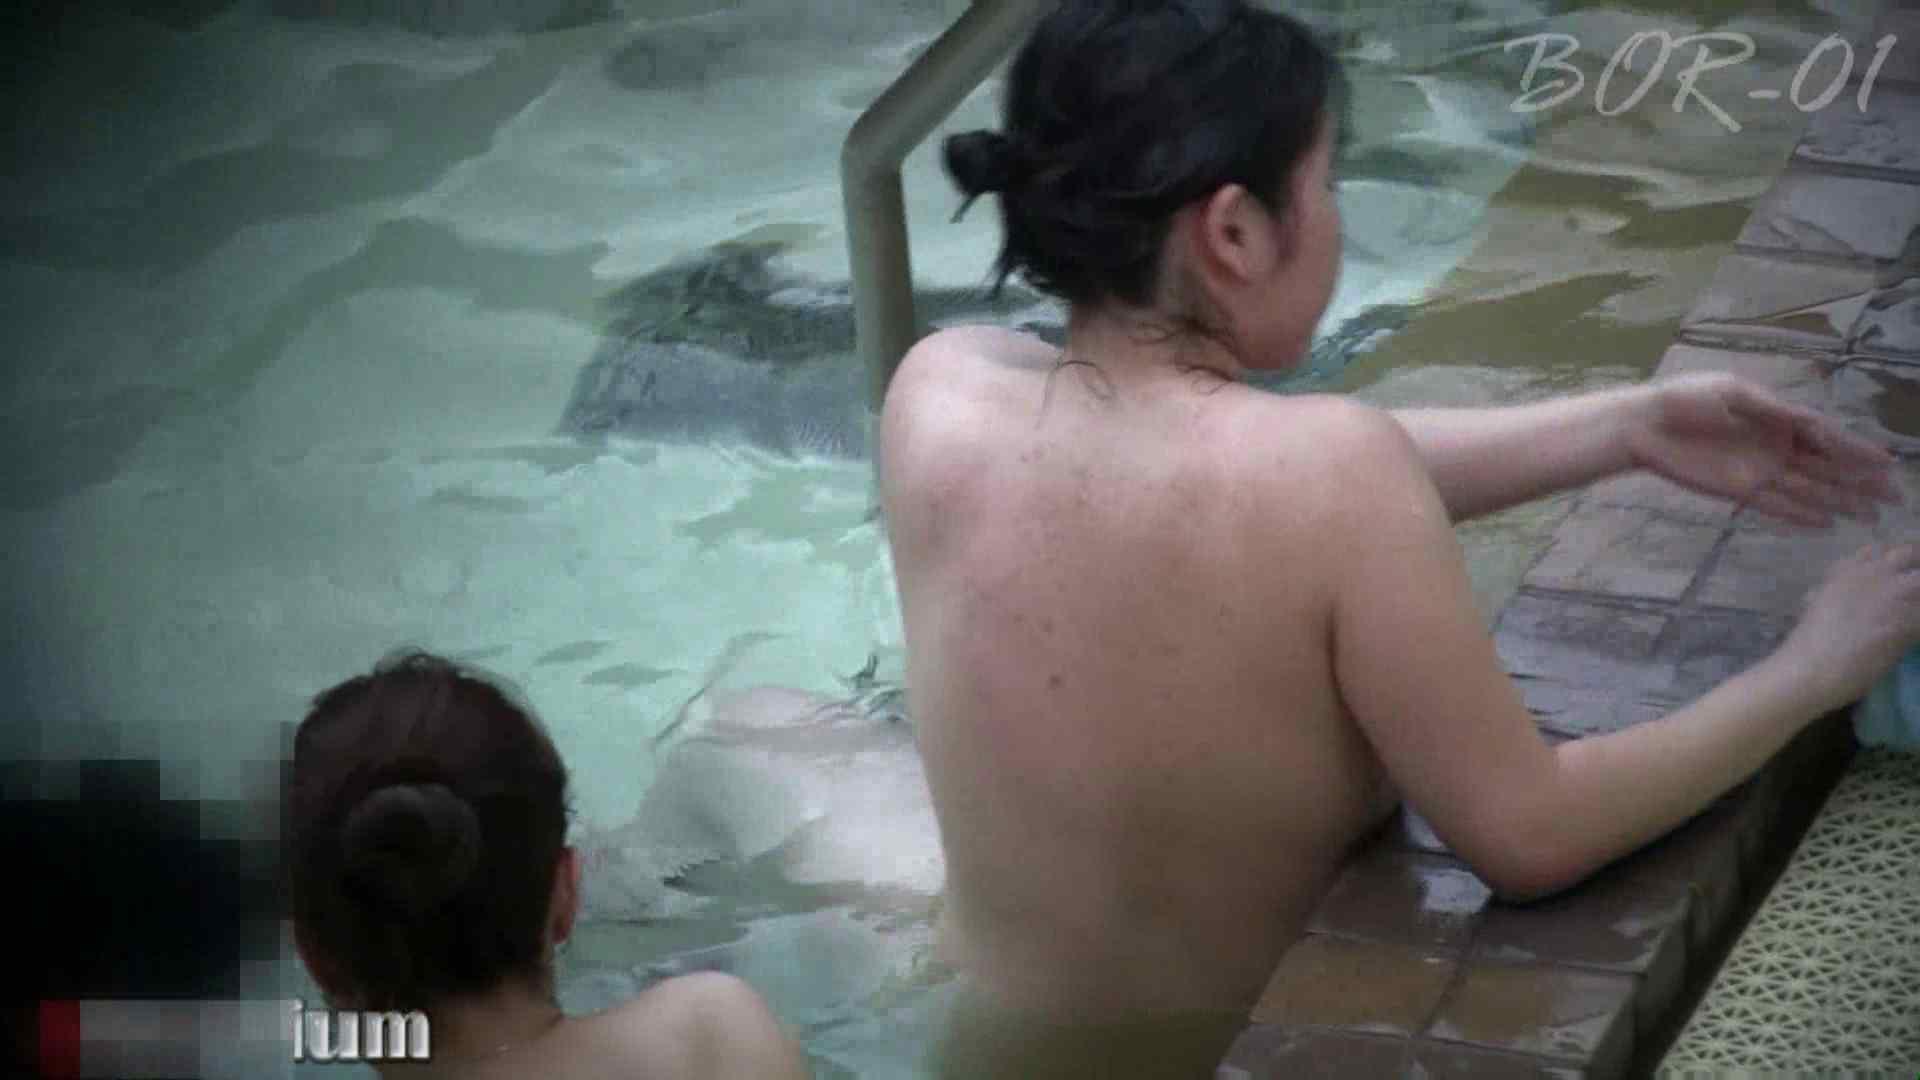 Aquaな露天風呂Vol.469 盗撮 エロ無料画像 51画像 41